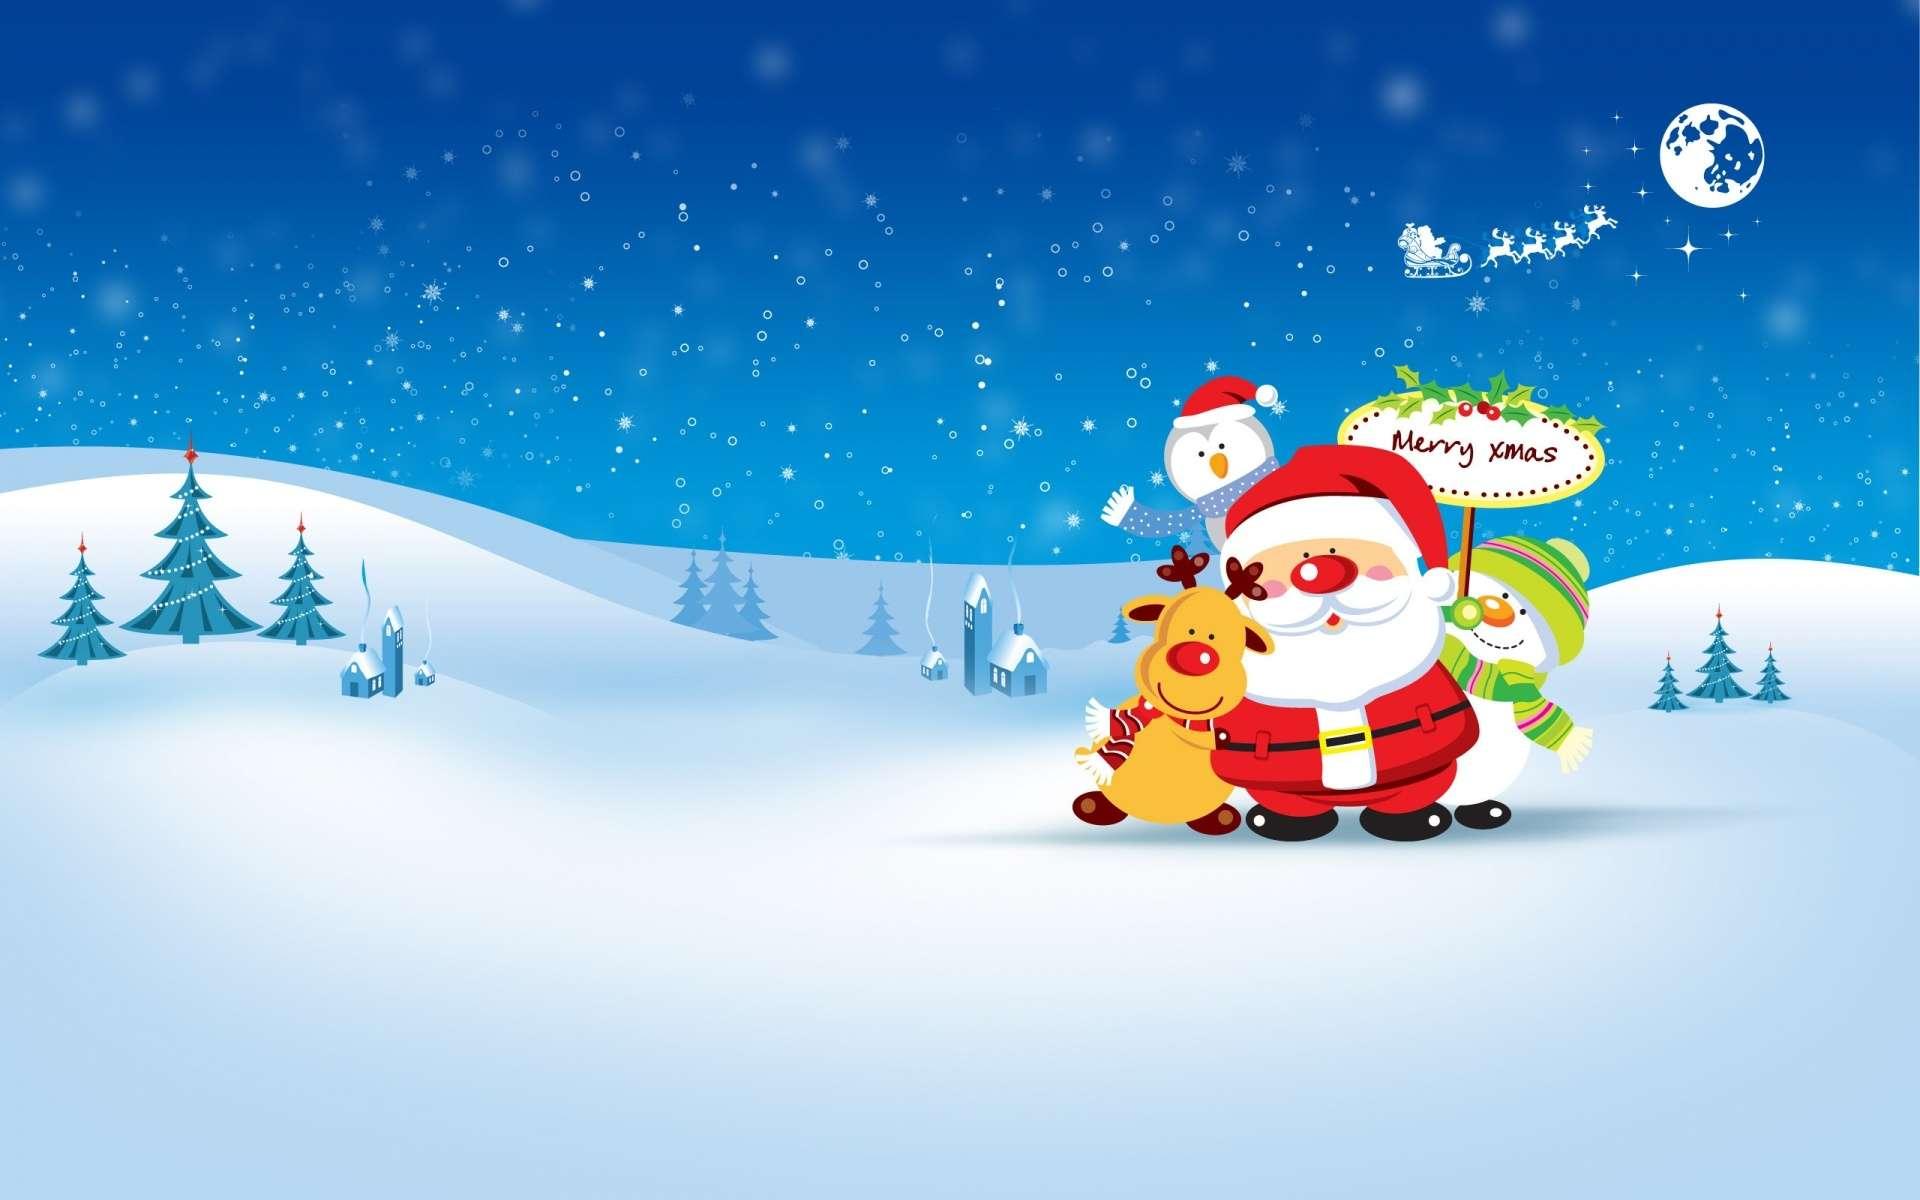 Christmas Winter Wallpaper 030